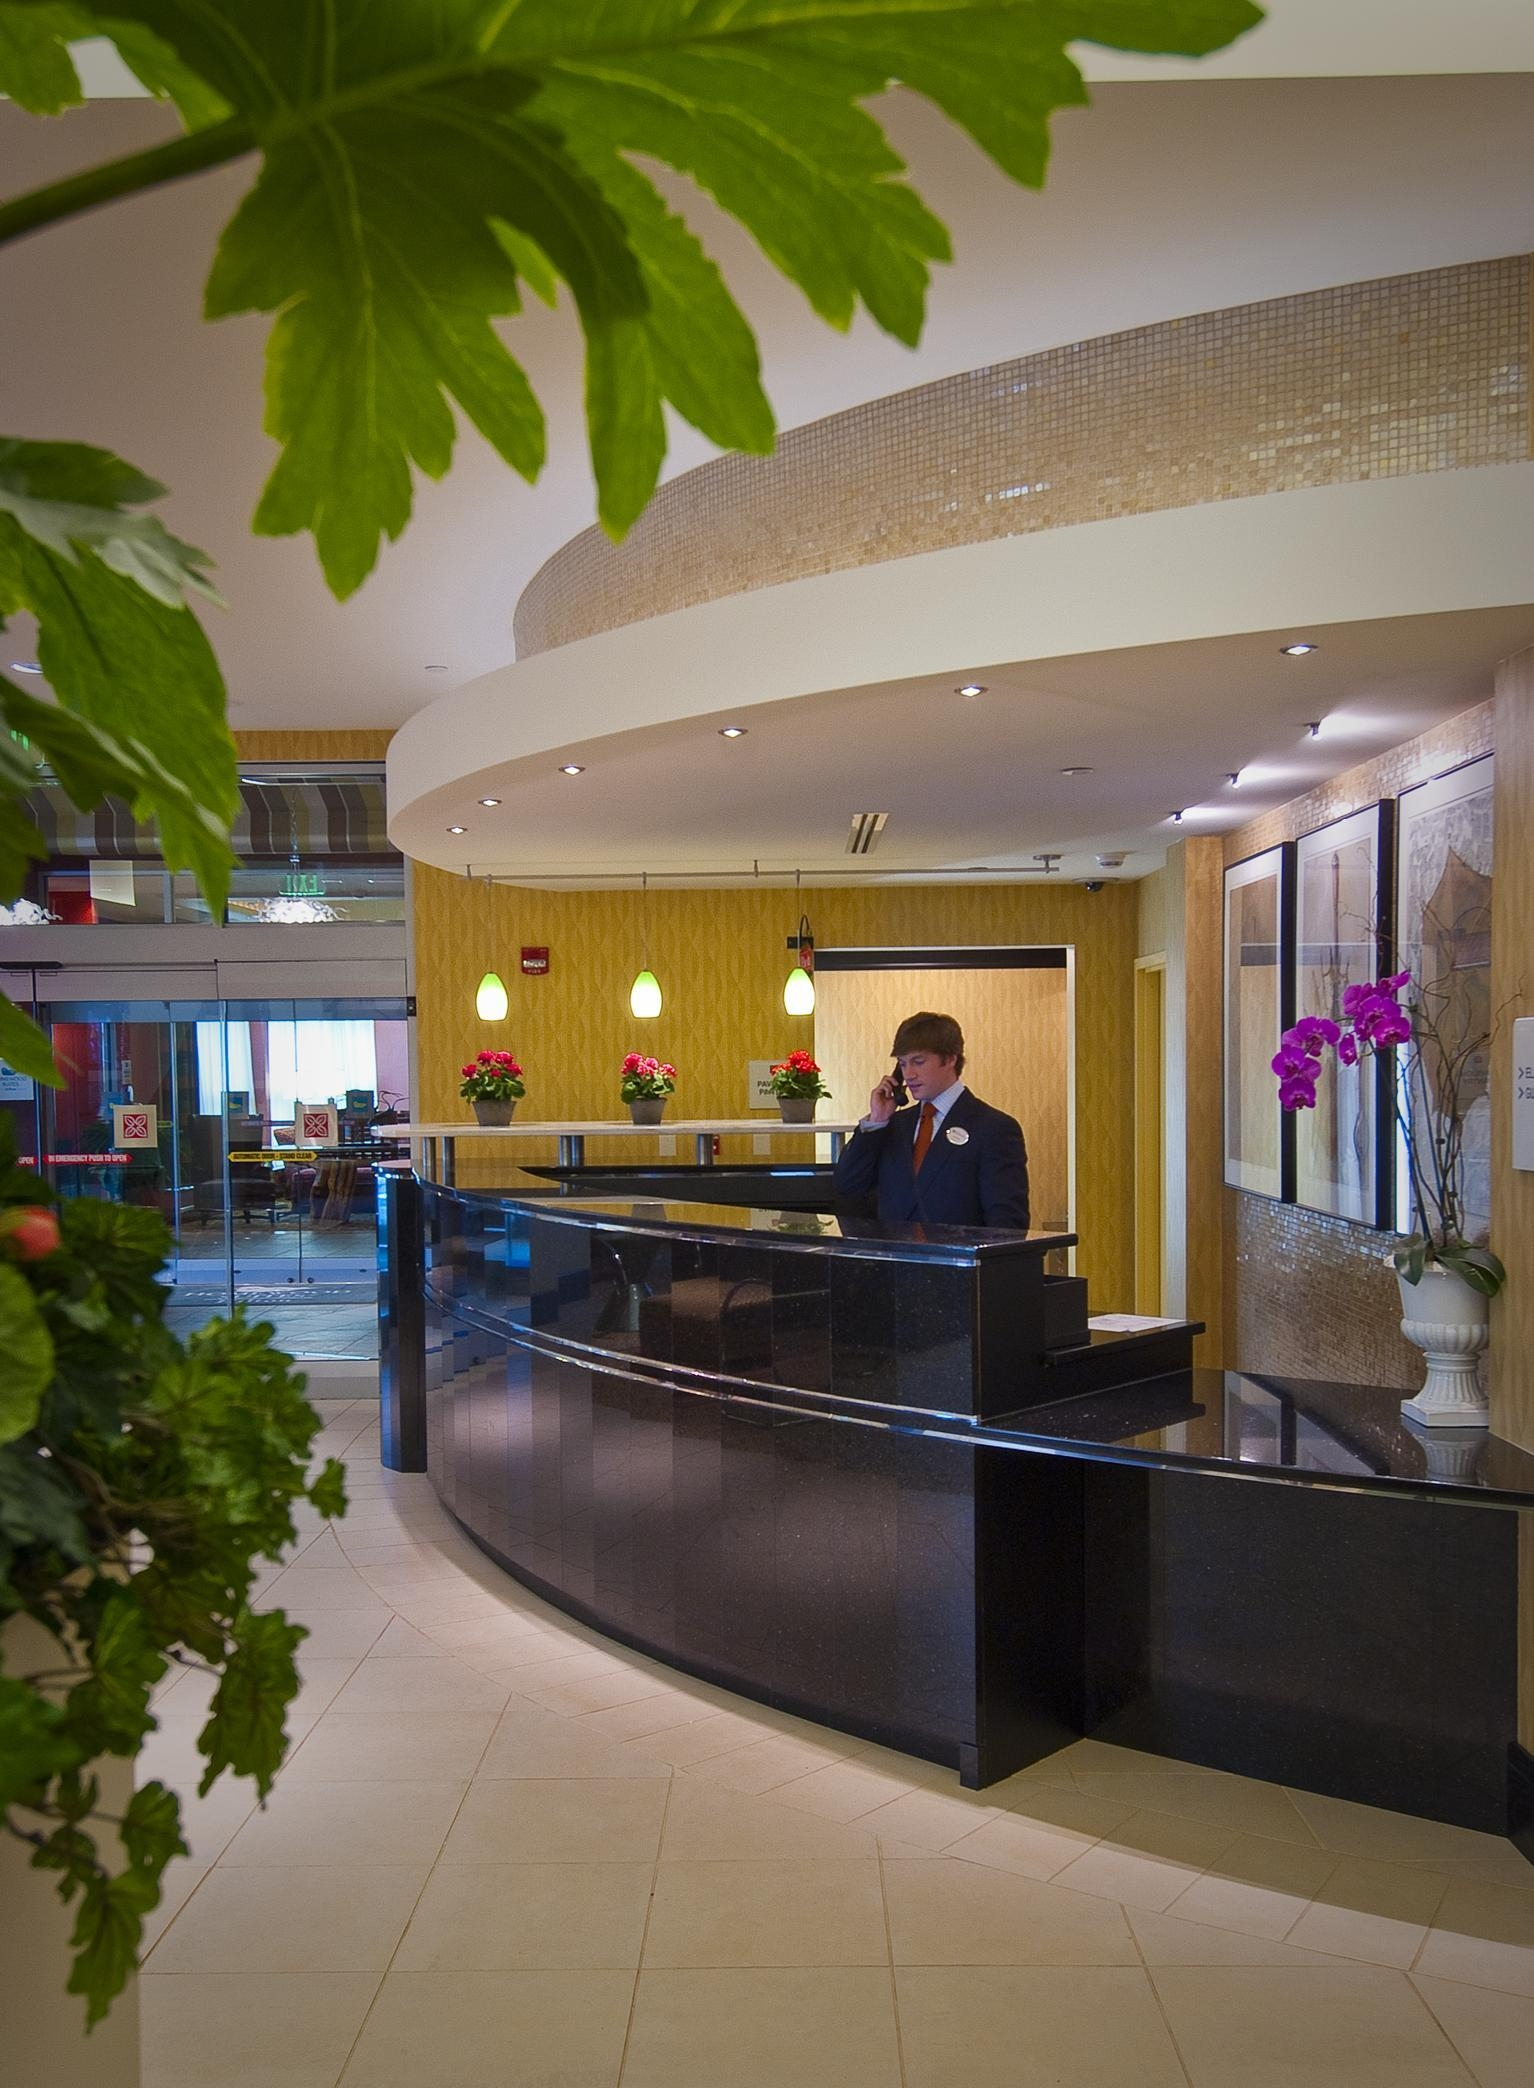 Hilton Garden Inn Rockville-Gaithersburg image 13